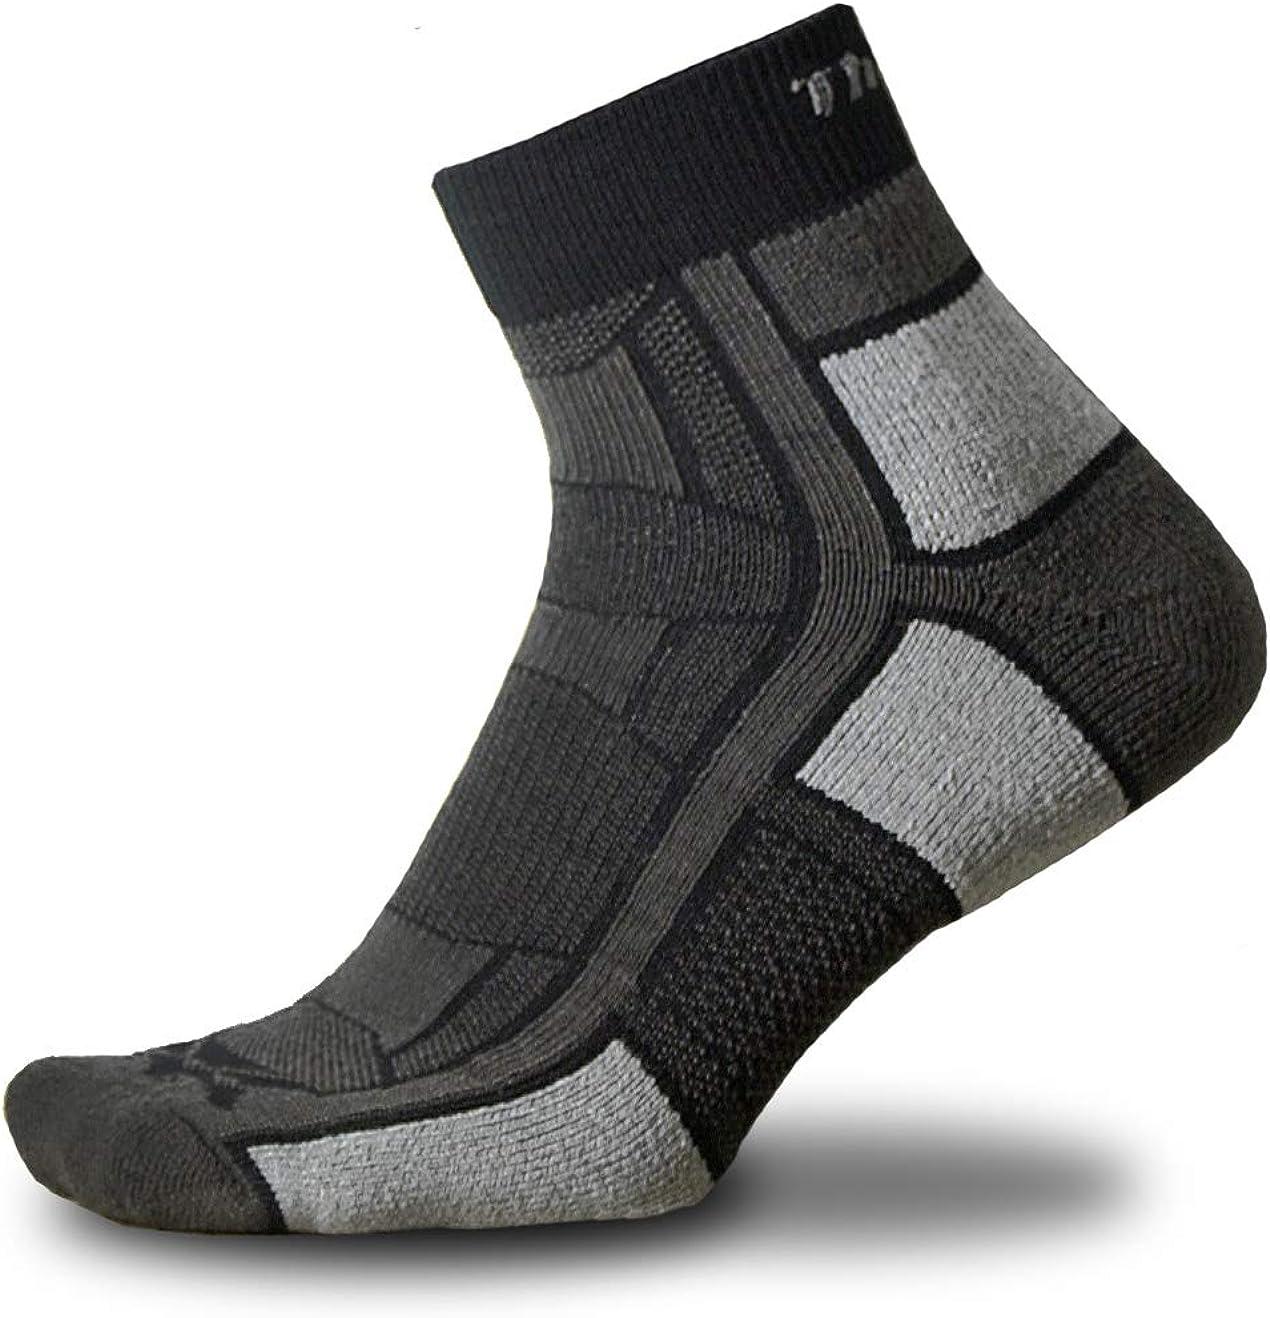 thorlos Max 79% OFF mens Year-end annual account Oaqu Thin Cushion Ankle Outdoor Athlete Socks